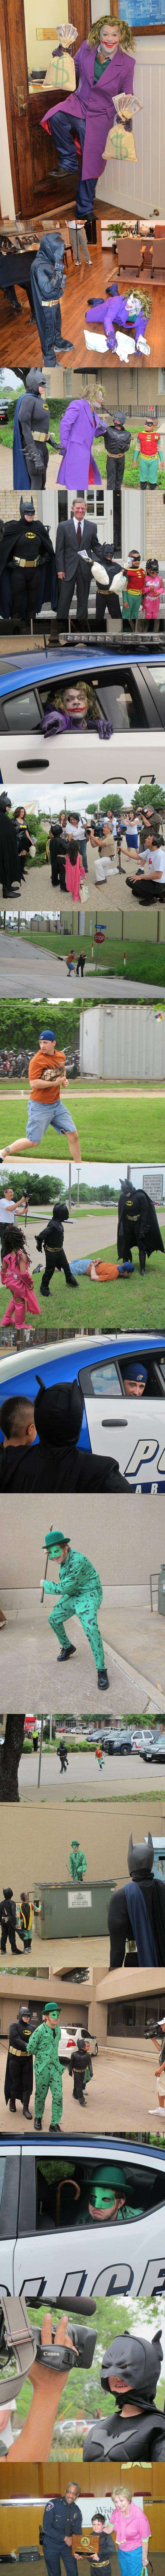 "Local police help 7 y.o. leukemia patient play ""Batman"". Faith in humainty = restored"